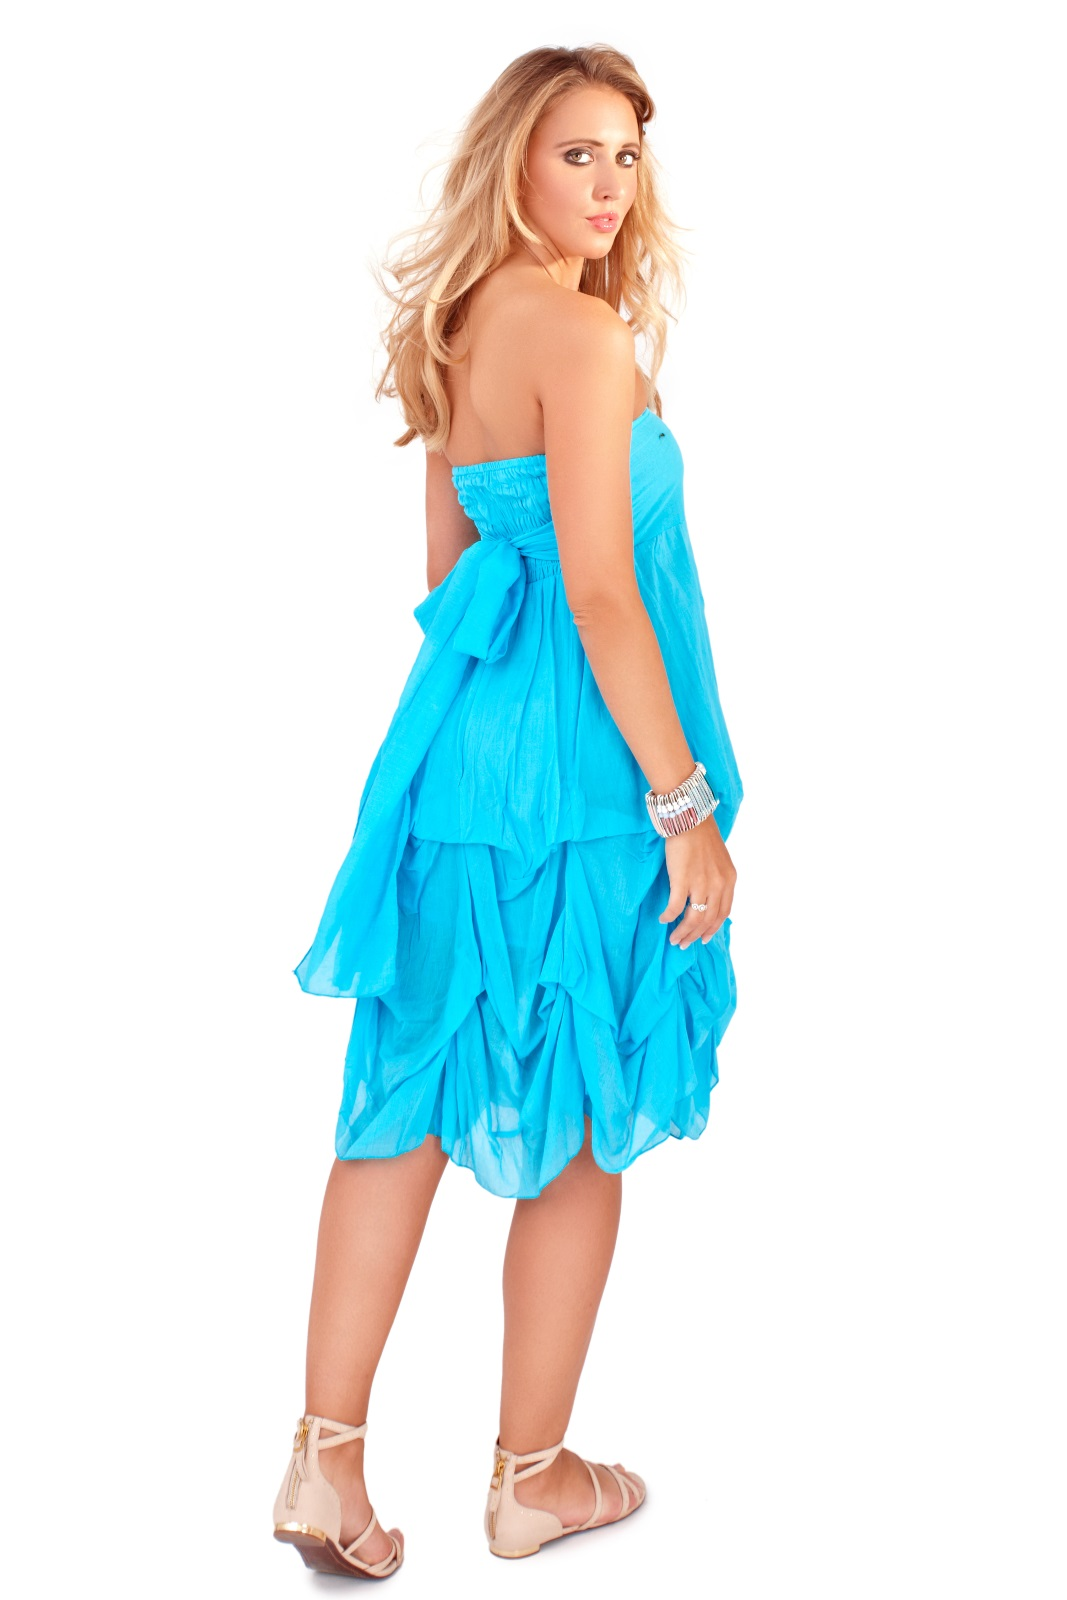 Womens Strapless Summer Dress Beach Cover Up Ruffled Maxi ...